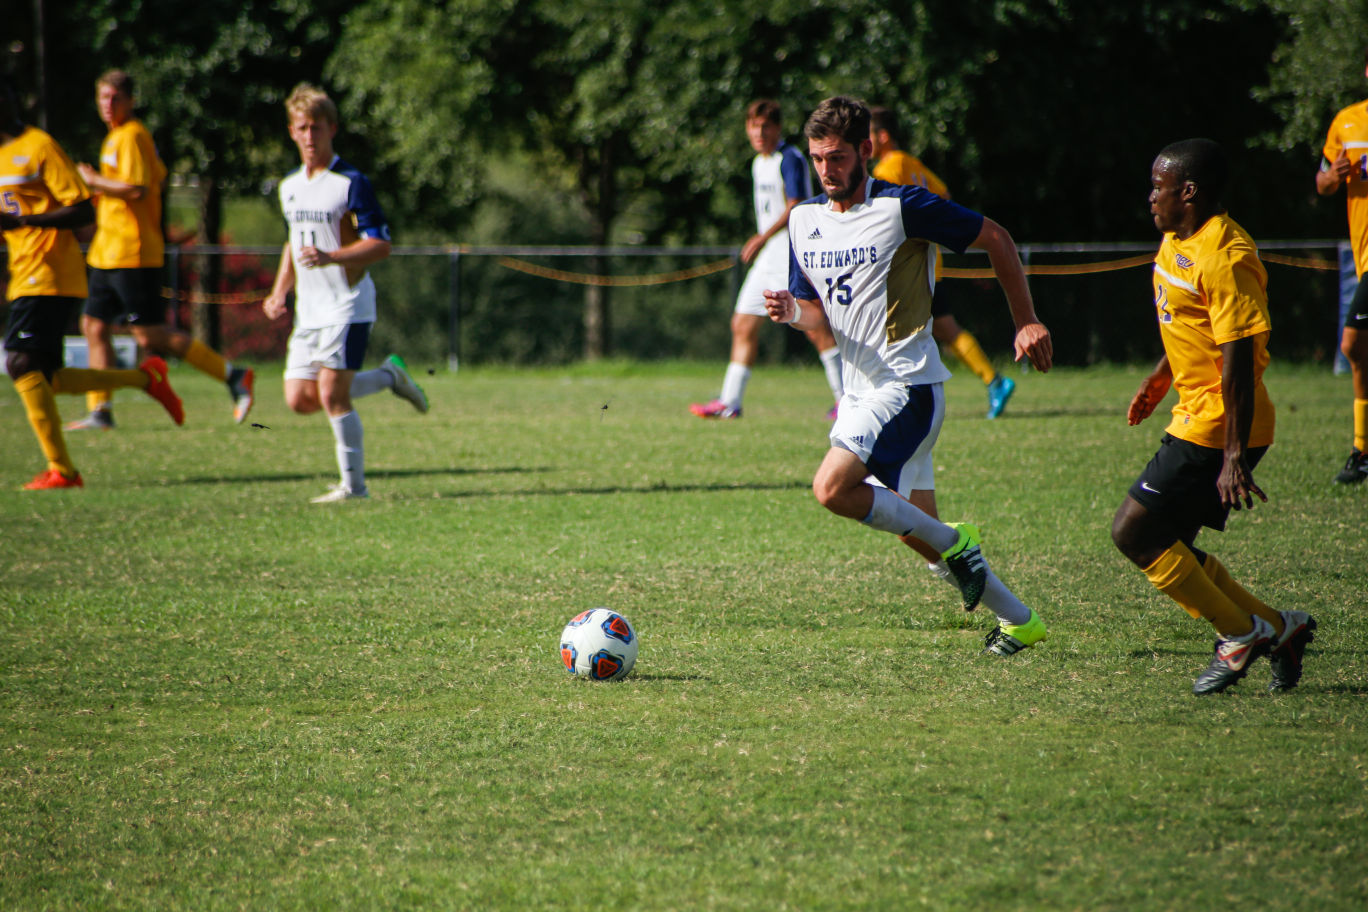 Junior midfielder Jack Blanton scored the winning goal on a penalty kick against Texas A&M-International University in extra time on Nov. 7.